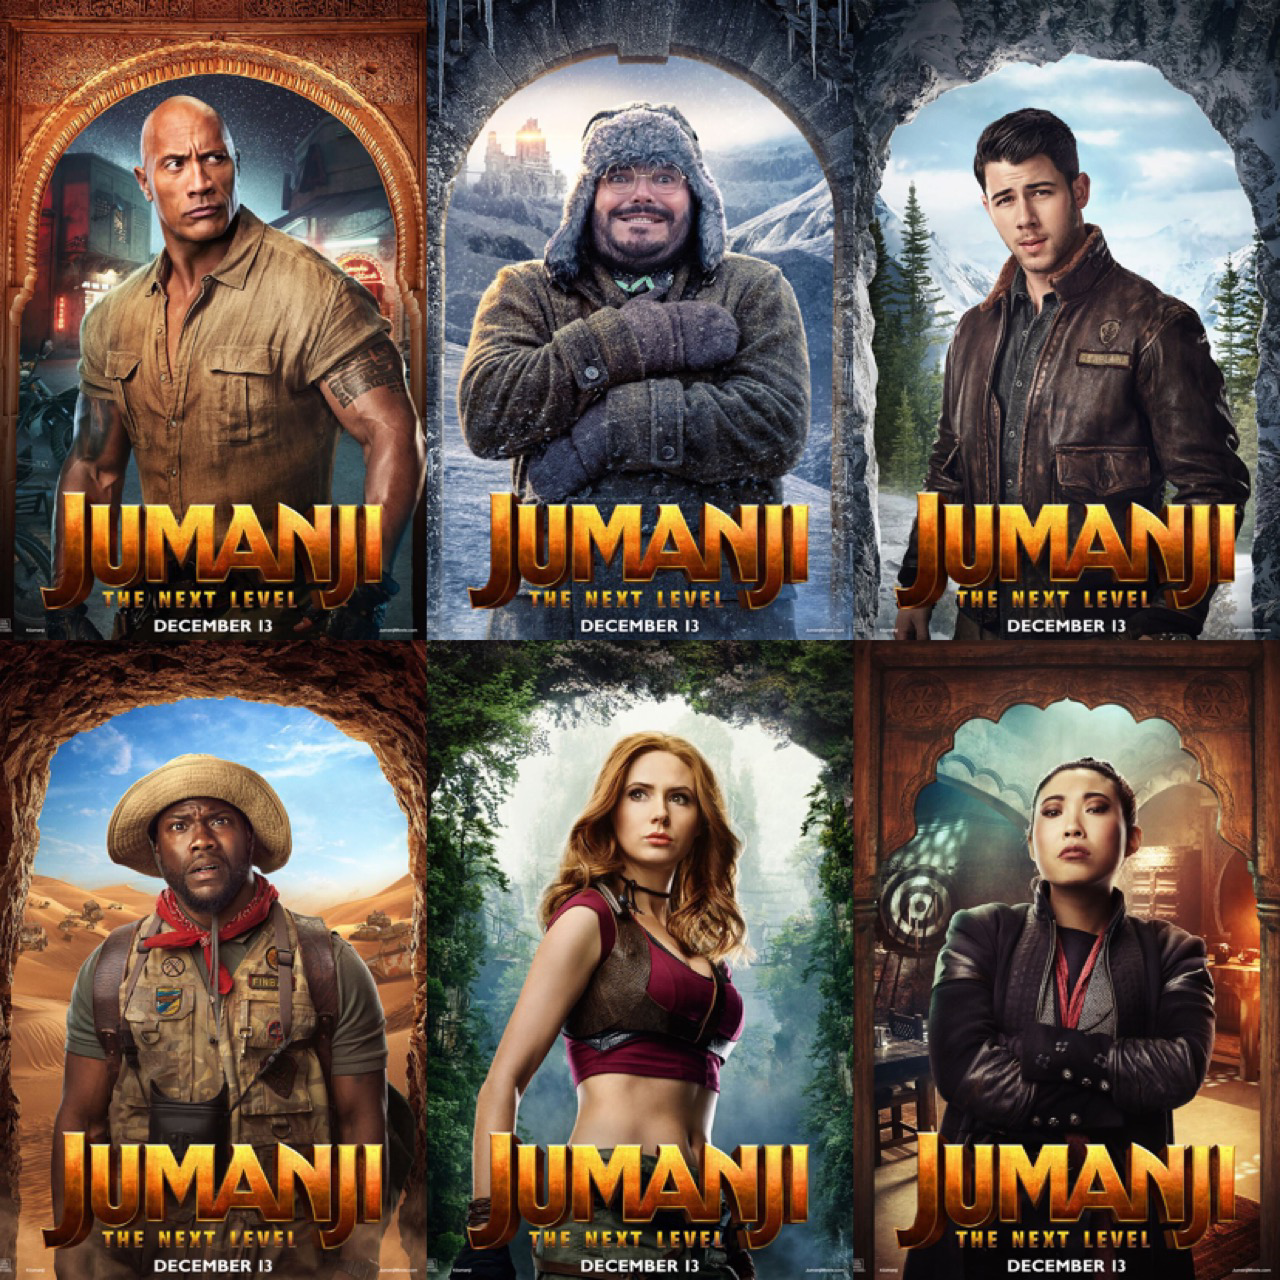 Movies Jumanji The Next Level Character Posters Jumanjinextlevel Jumanjimovie Jumanji2019 Free Movies Online Jumanji Movie Movies To Watch